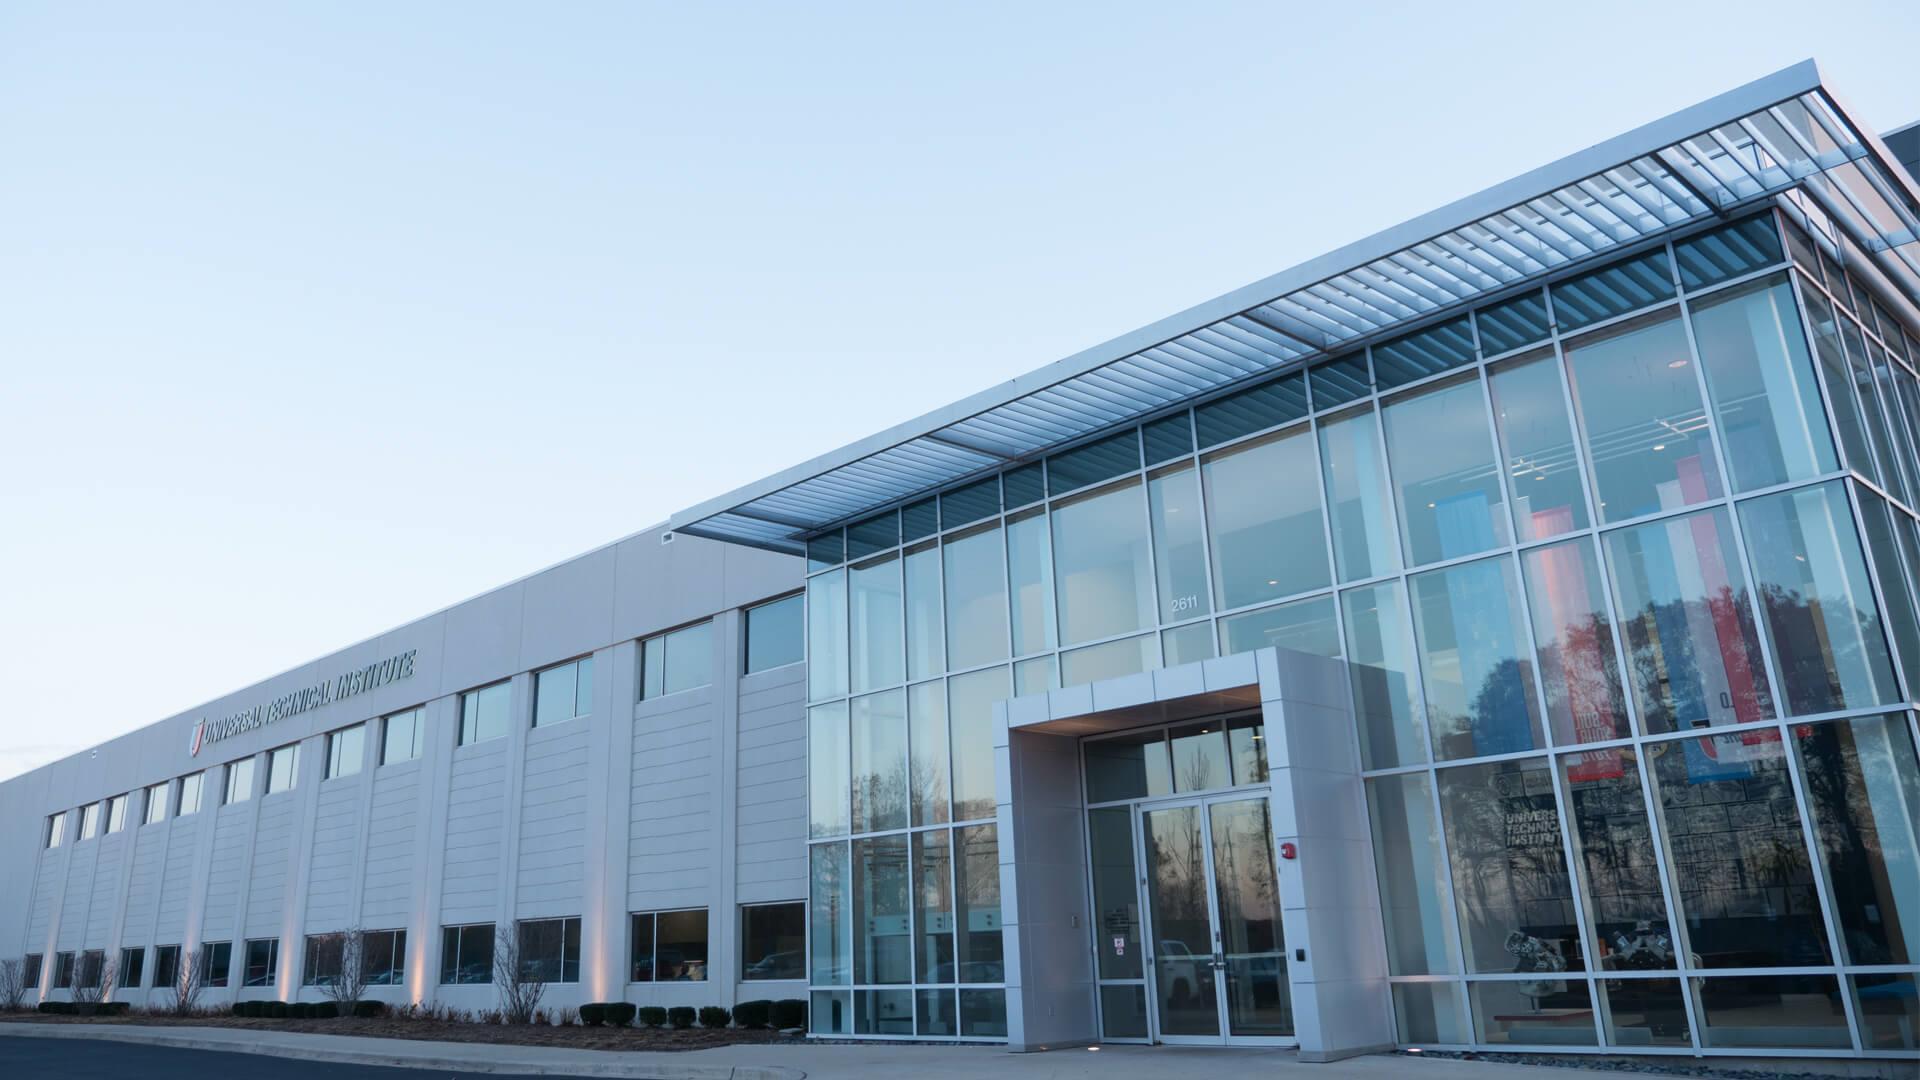 Lisle Trade School Campus Safety